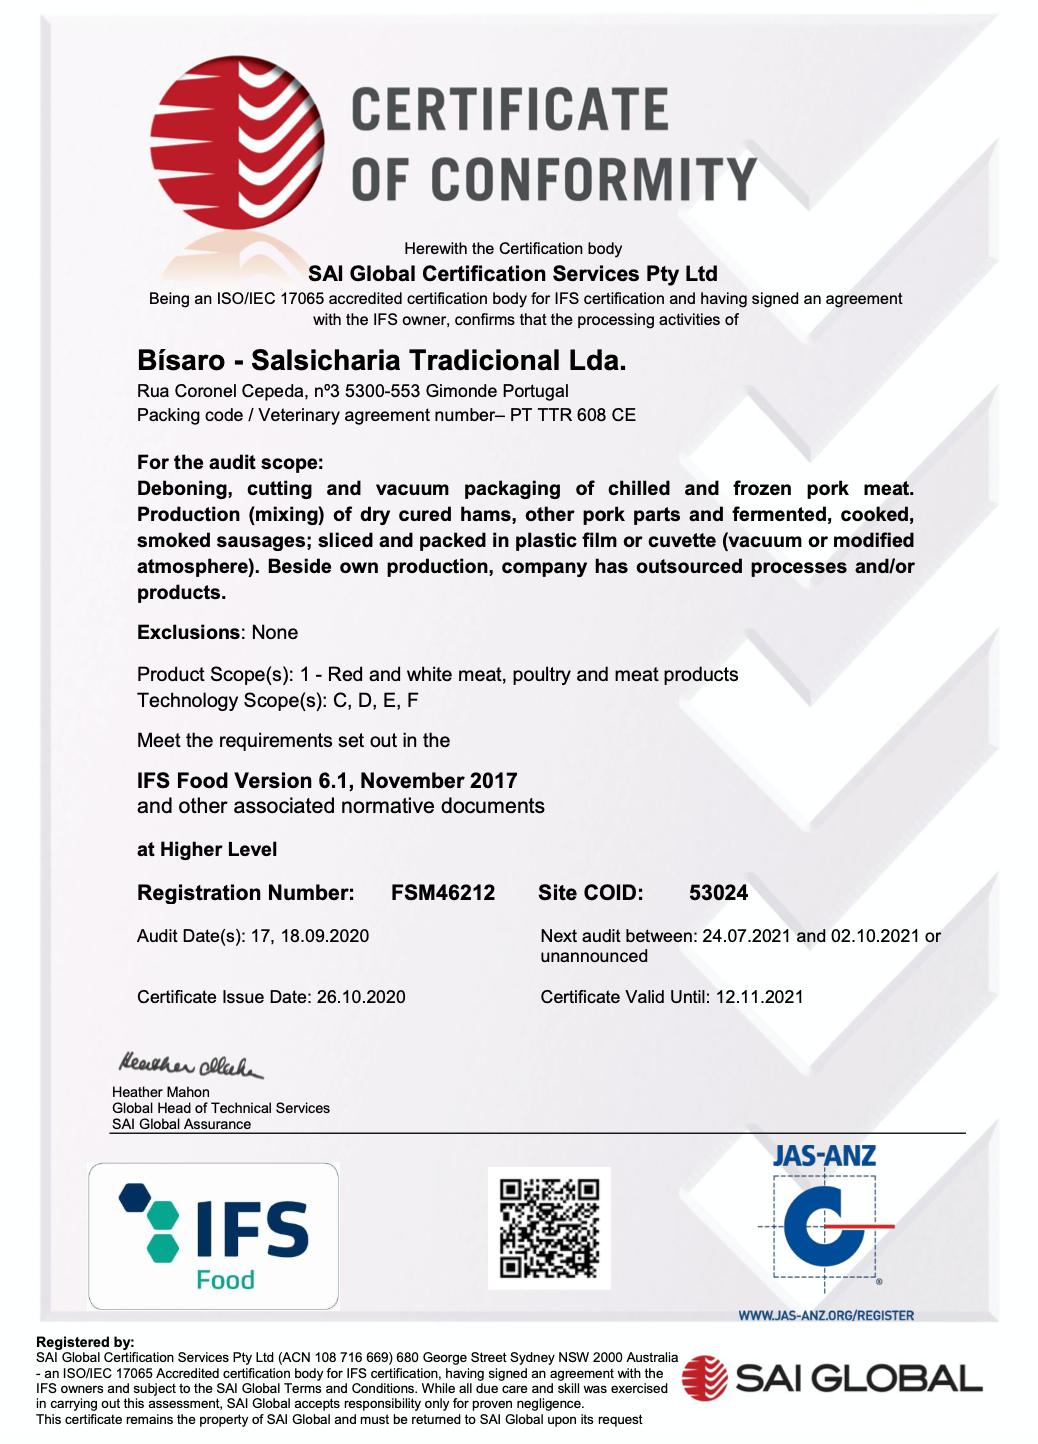 Certificação IFS - Food 2020